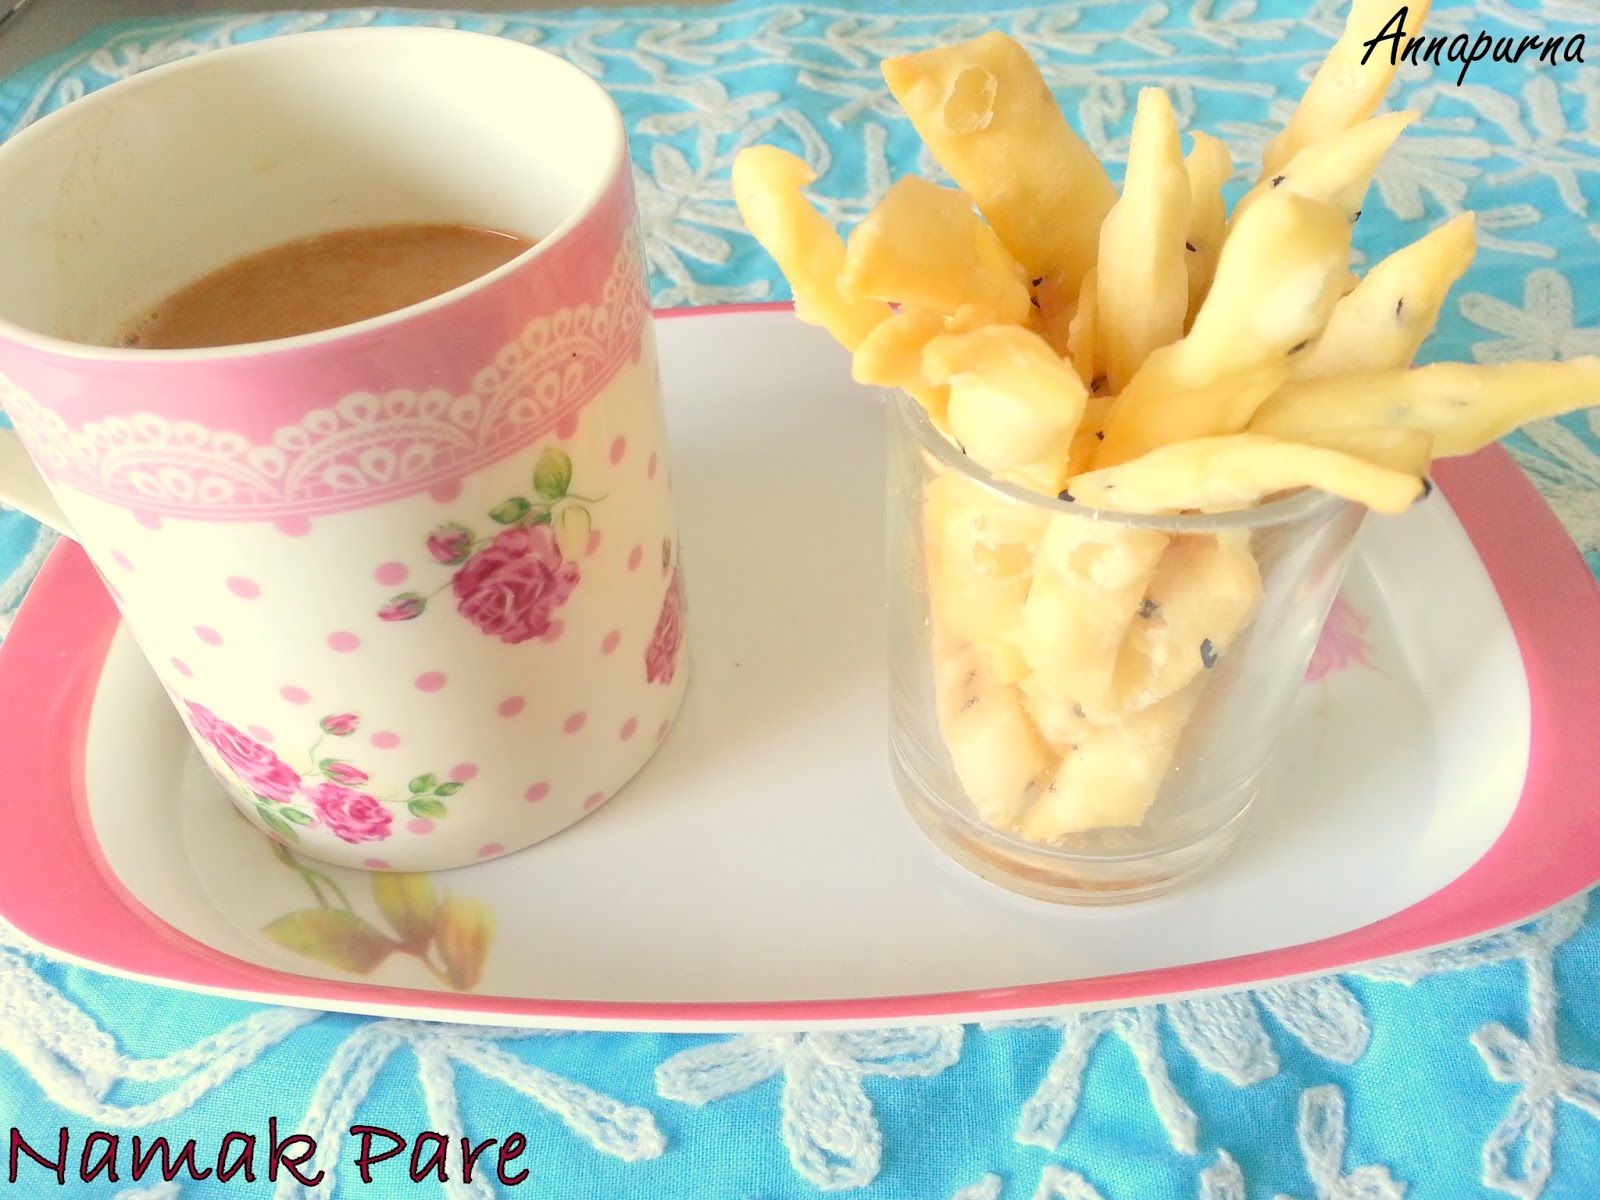 Annapurna namak pare kharat shankarpale crunchy savory indian namak pare kharat shankarpale crunchy savory indian tea time snack recipe diwali faral recipe forumfinder Image collections